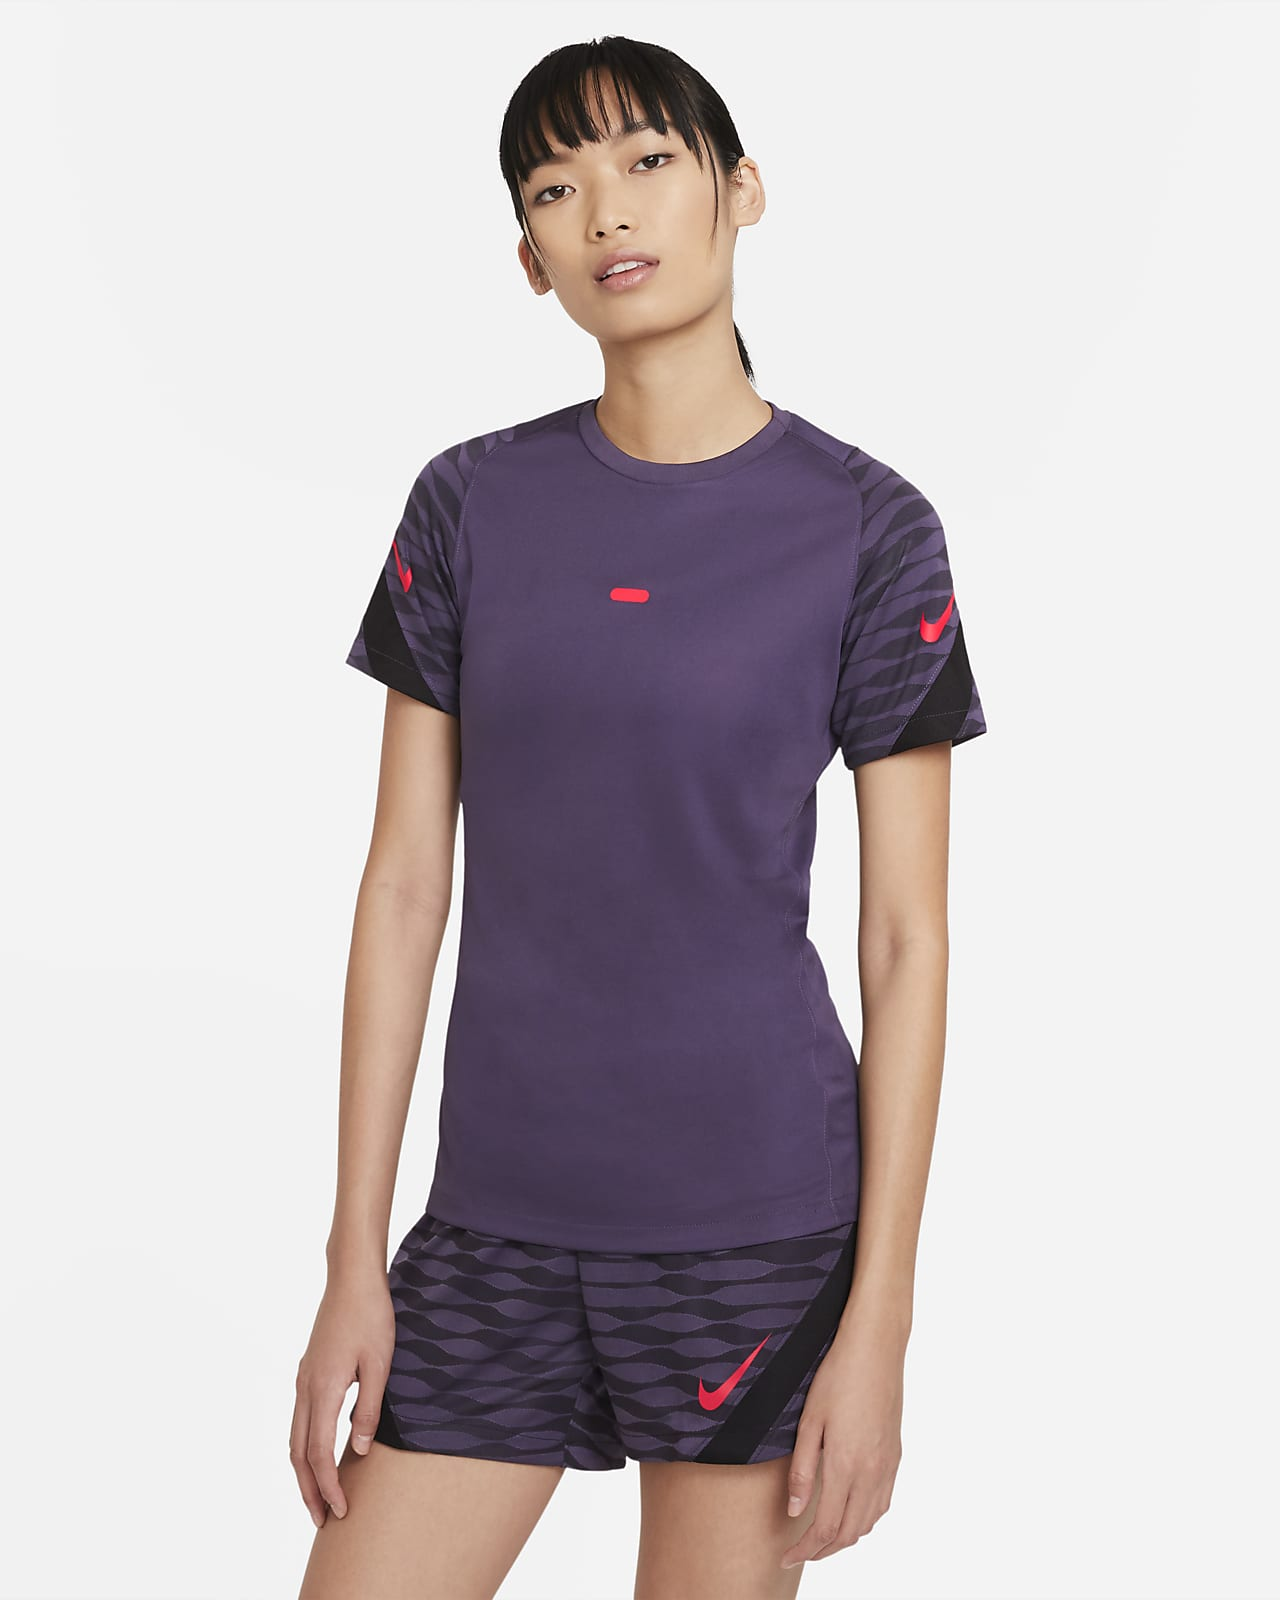 Nike Dri-FIT Strike rövid ujjú női futballfelső